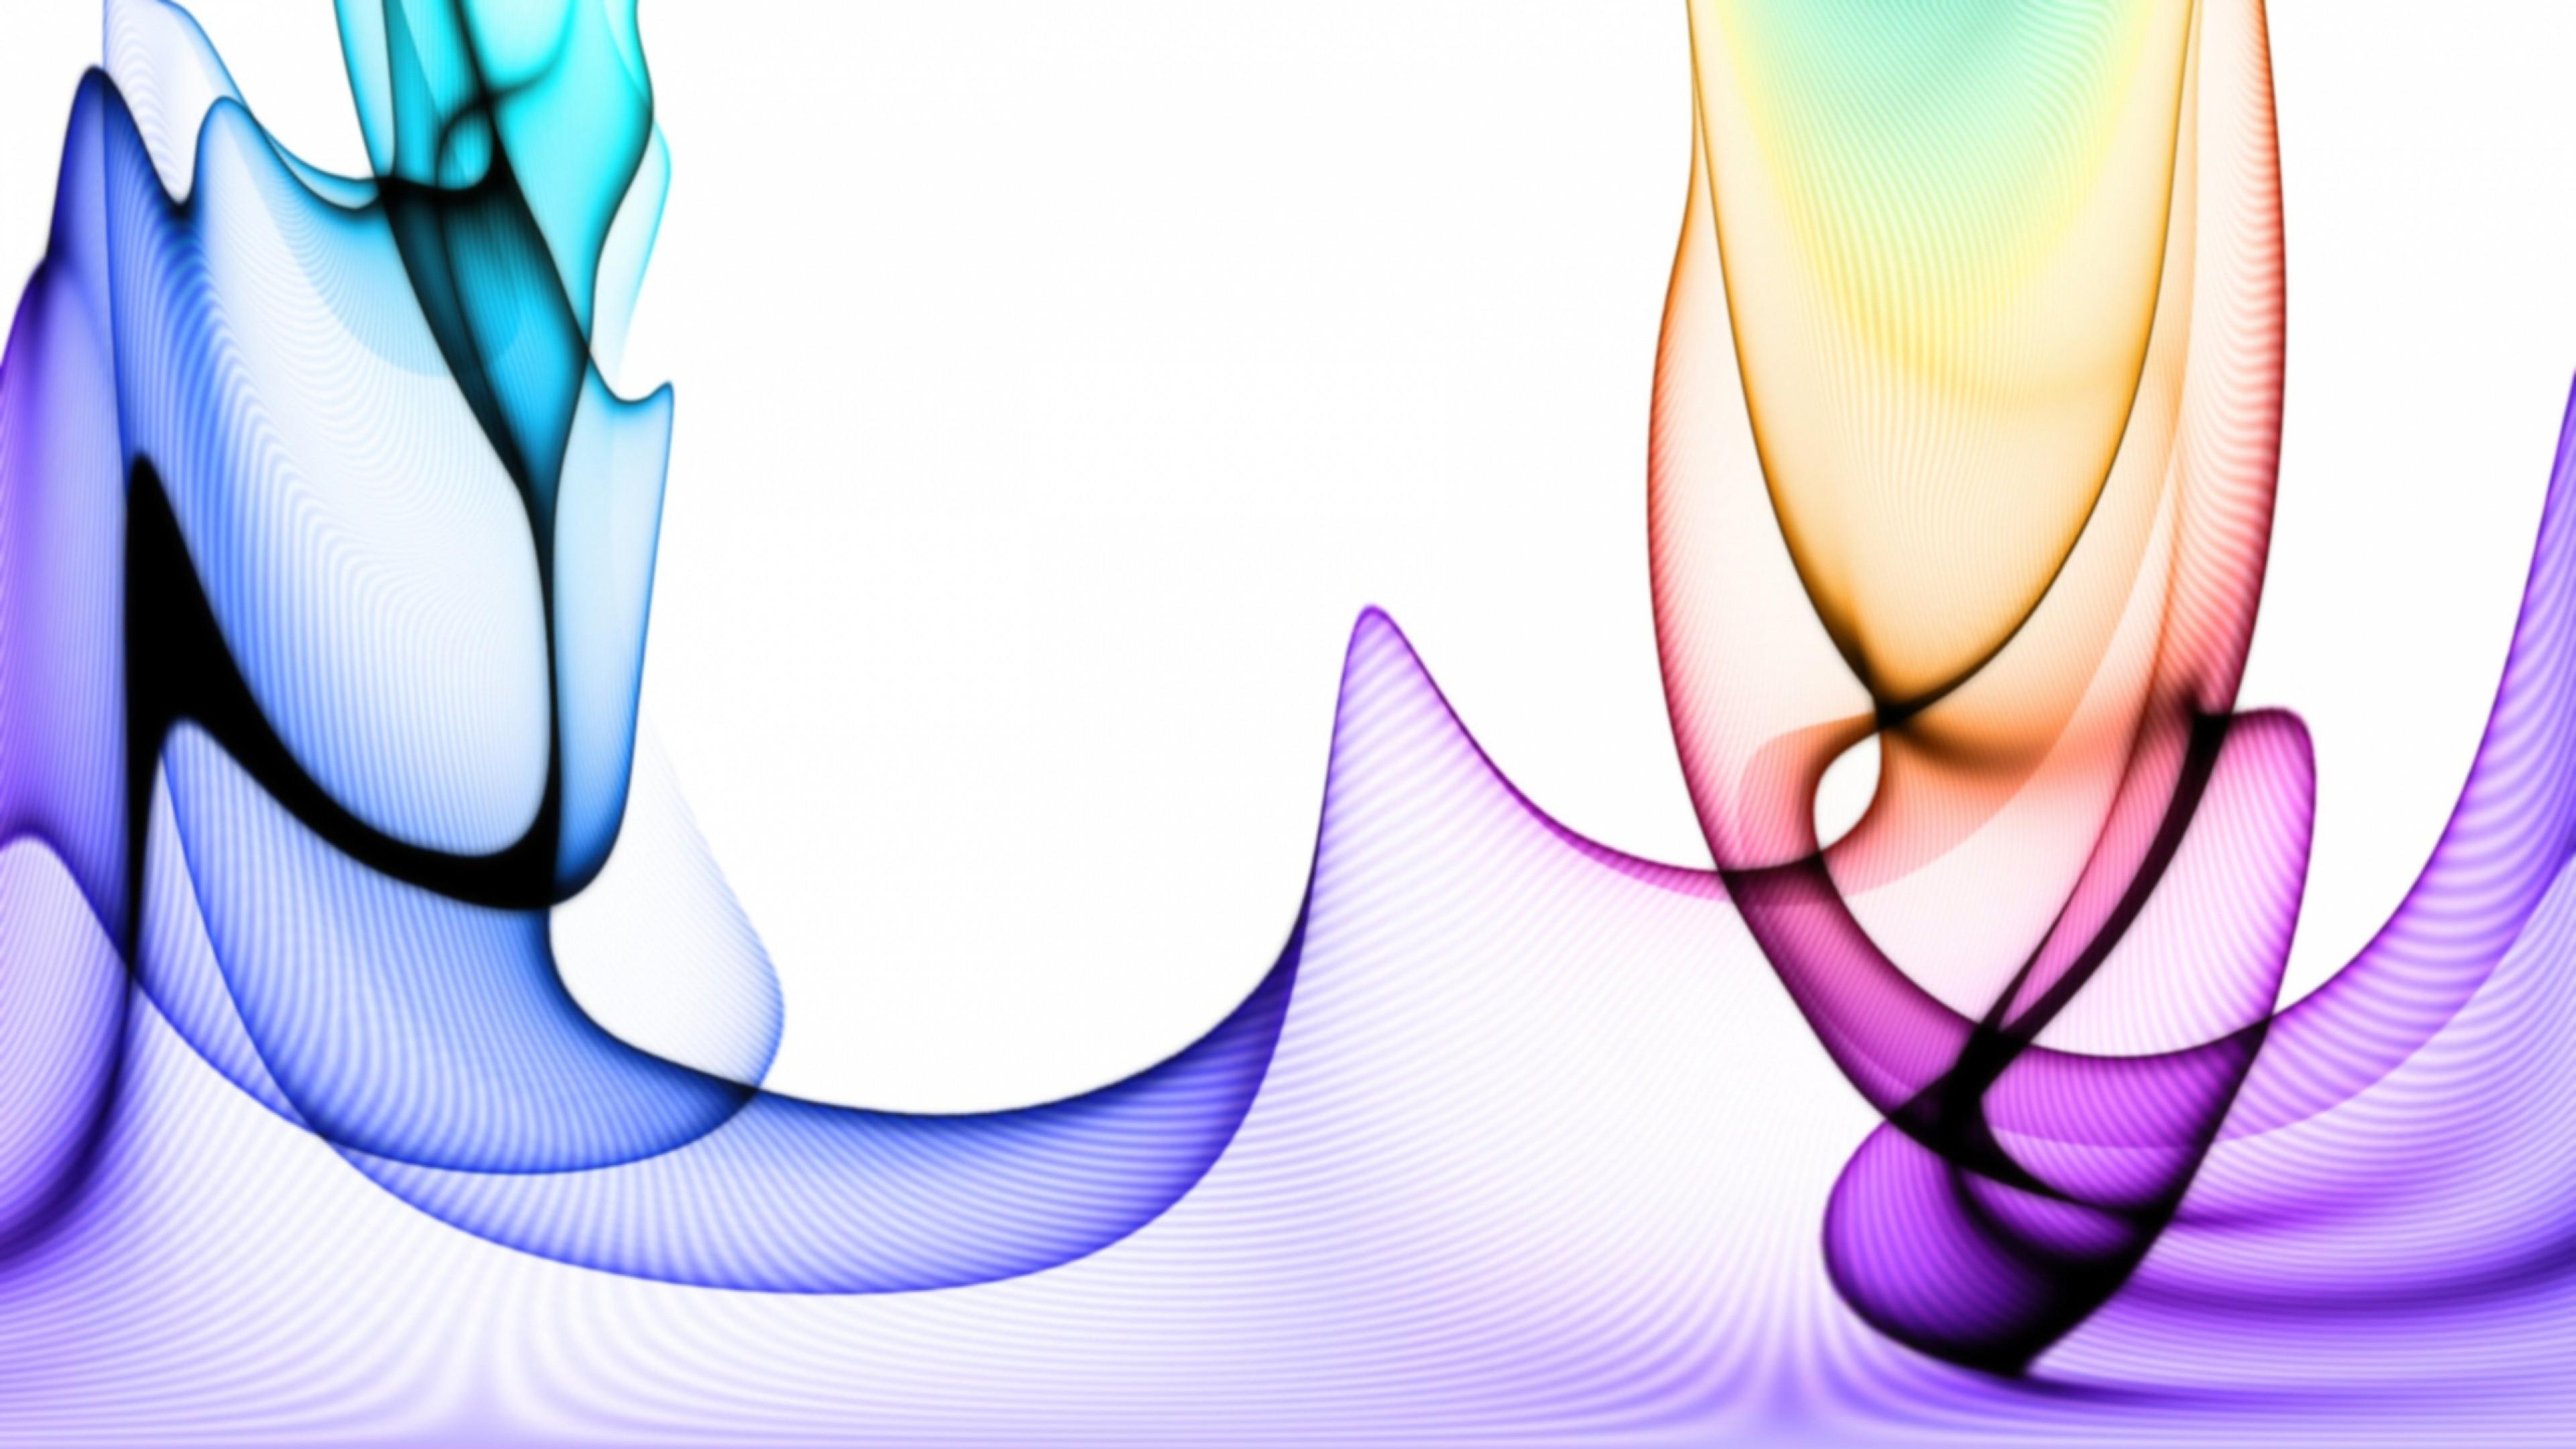 Wallpaper colorful, bright, light, veil, smoke